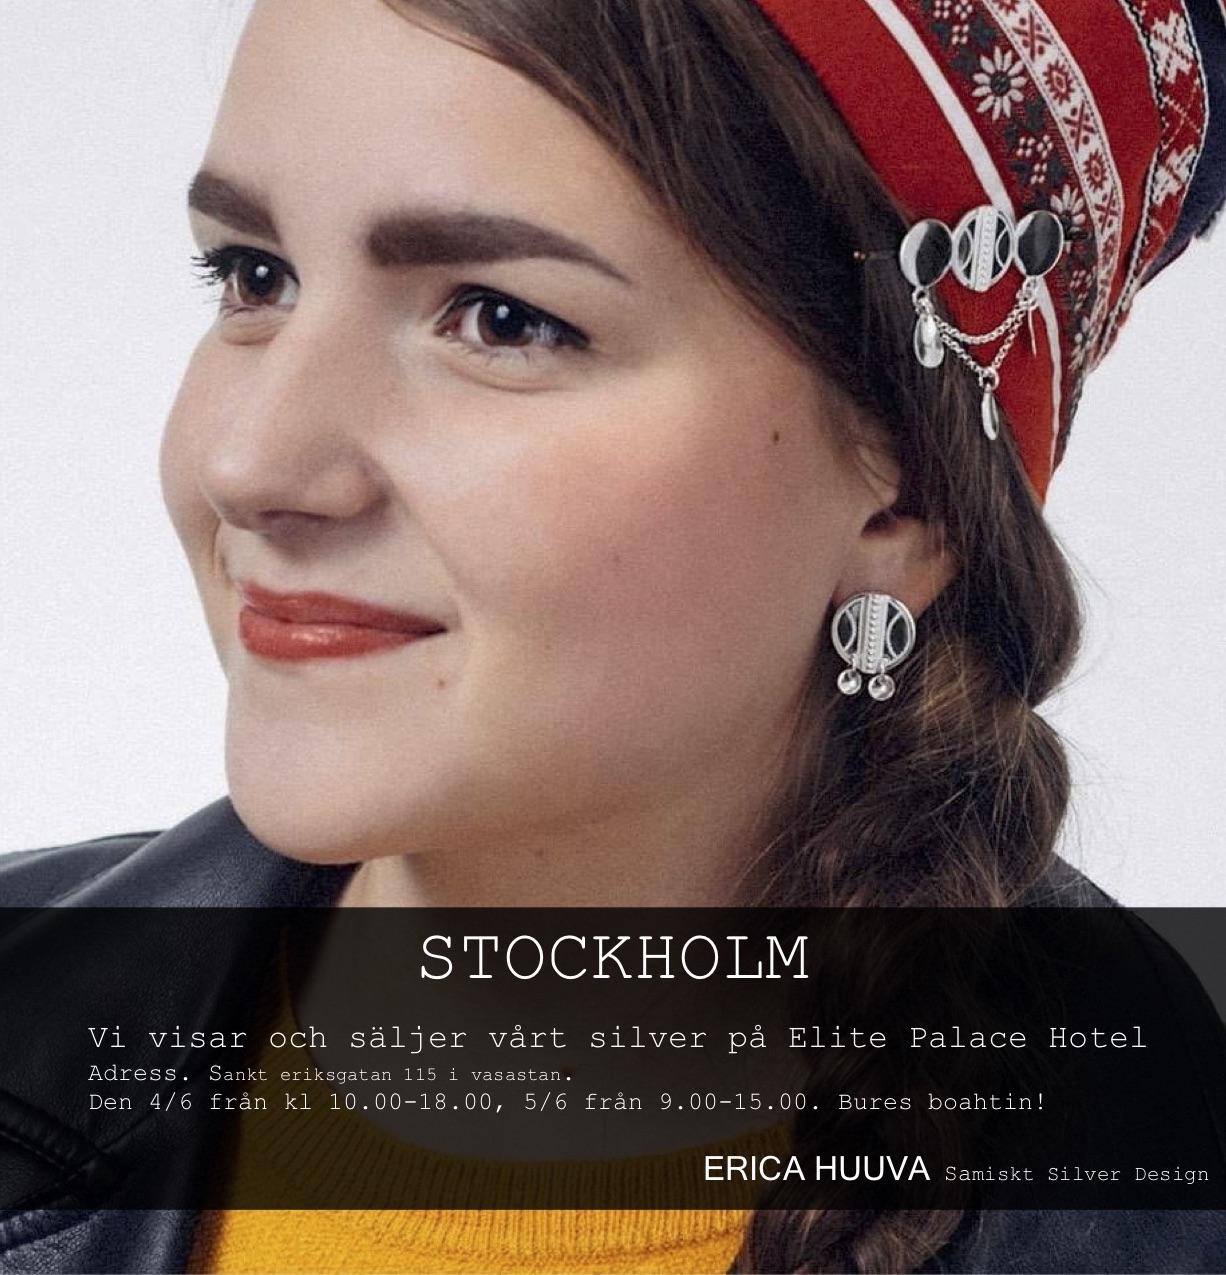 Erica Huuvas silver i Stockholm